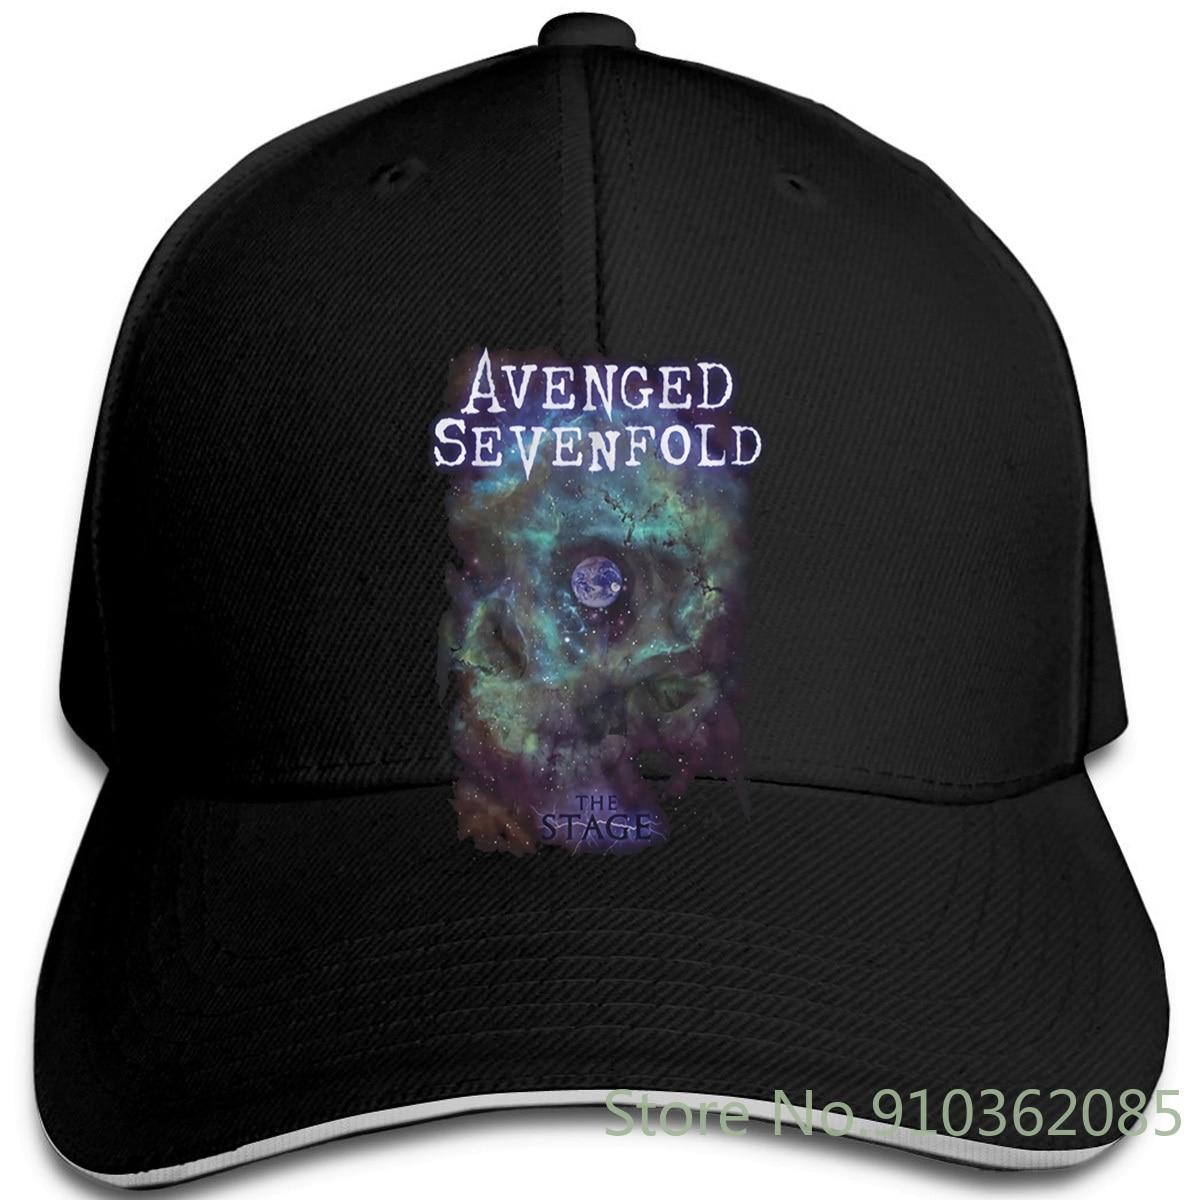 Avenged Sevenfold Space Face Rock Heavy Metal oficial Unisex ajustable gorras de béisbol hombres mujeres